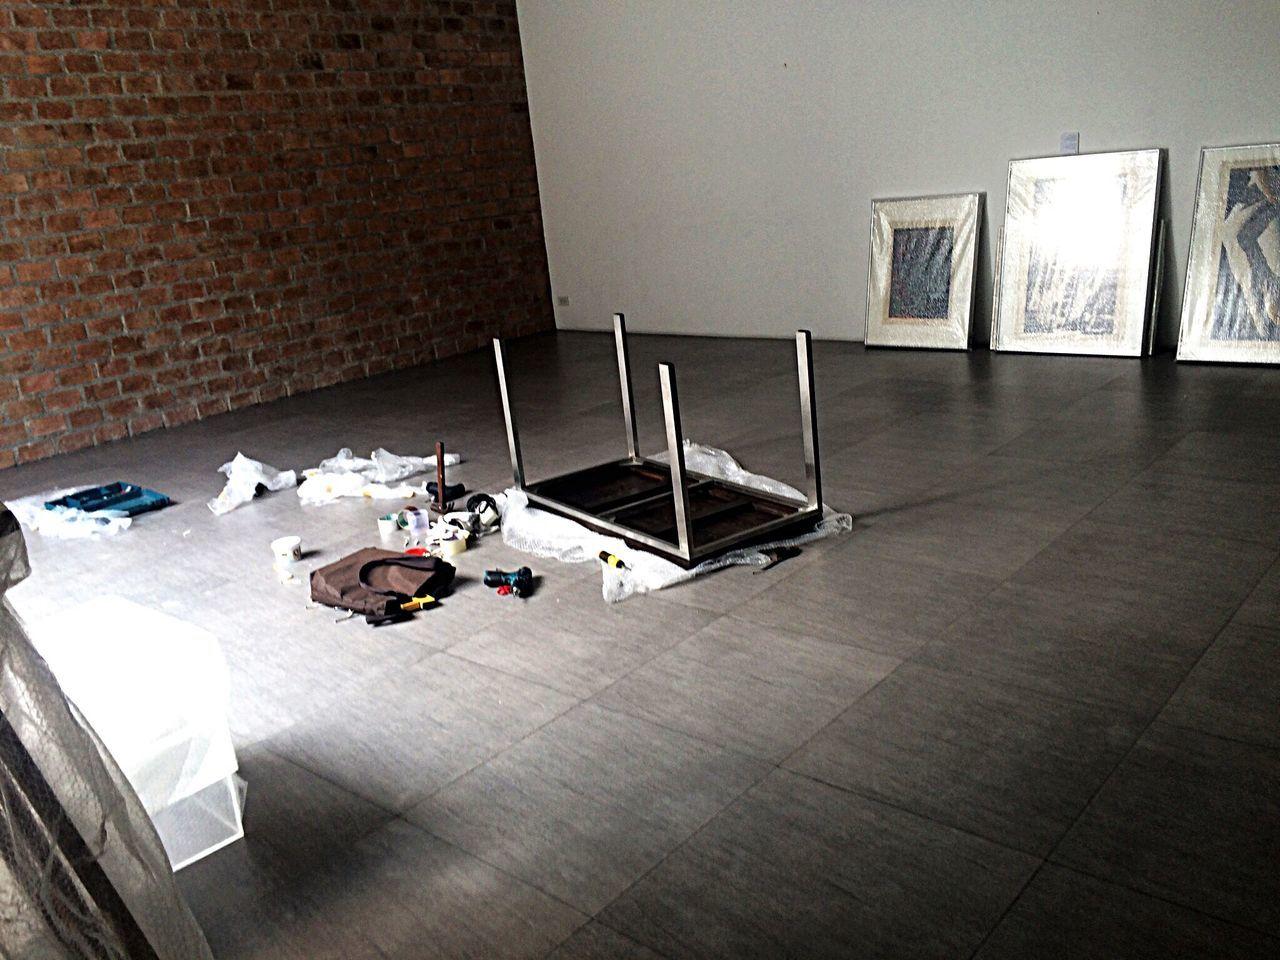 Gallery Installation Art Fixture Bkkgallery